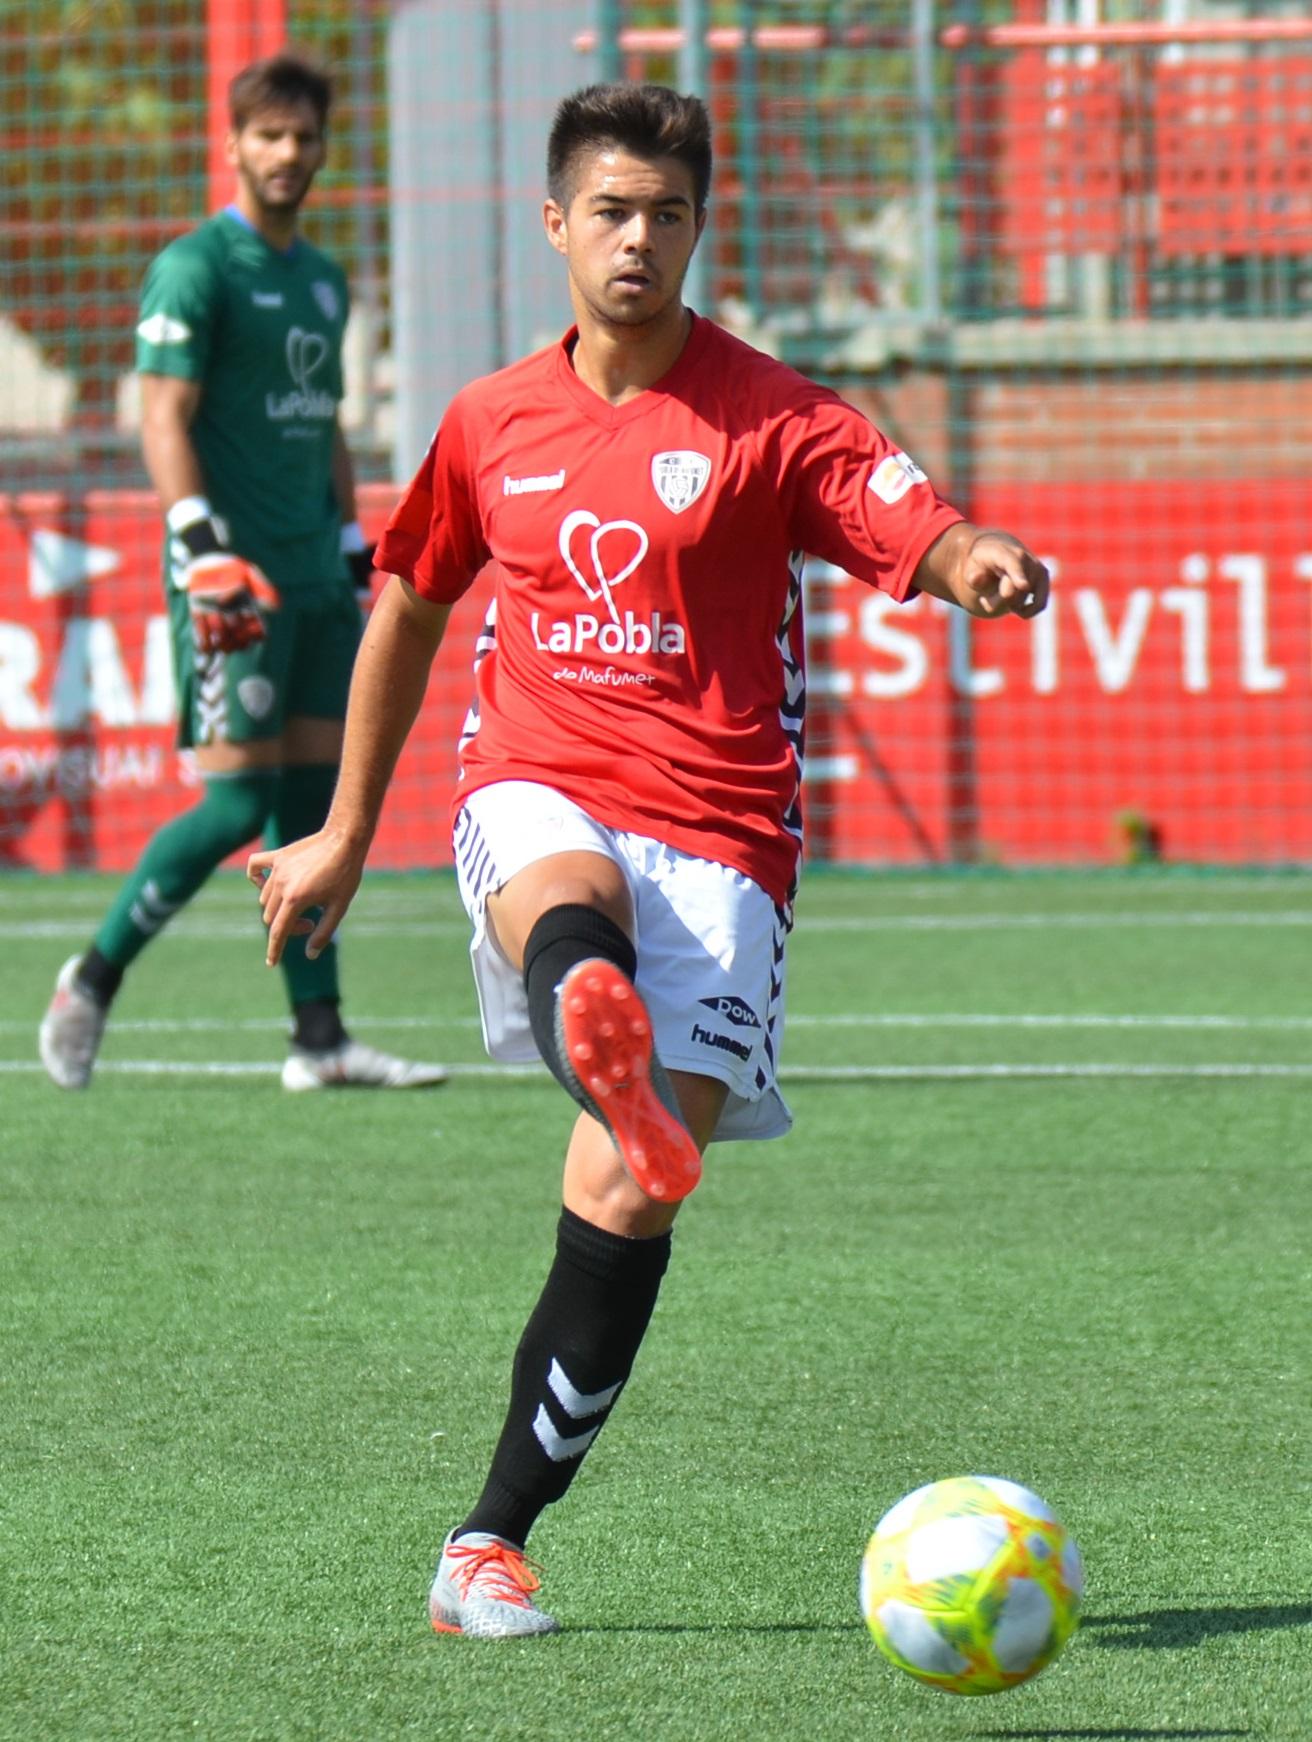 Victòria del CF Pobla de Mafumet davant el San Cristóbal per 2 a 0